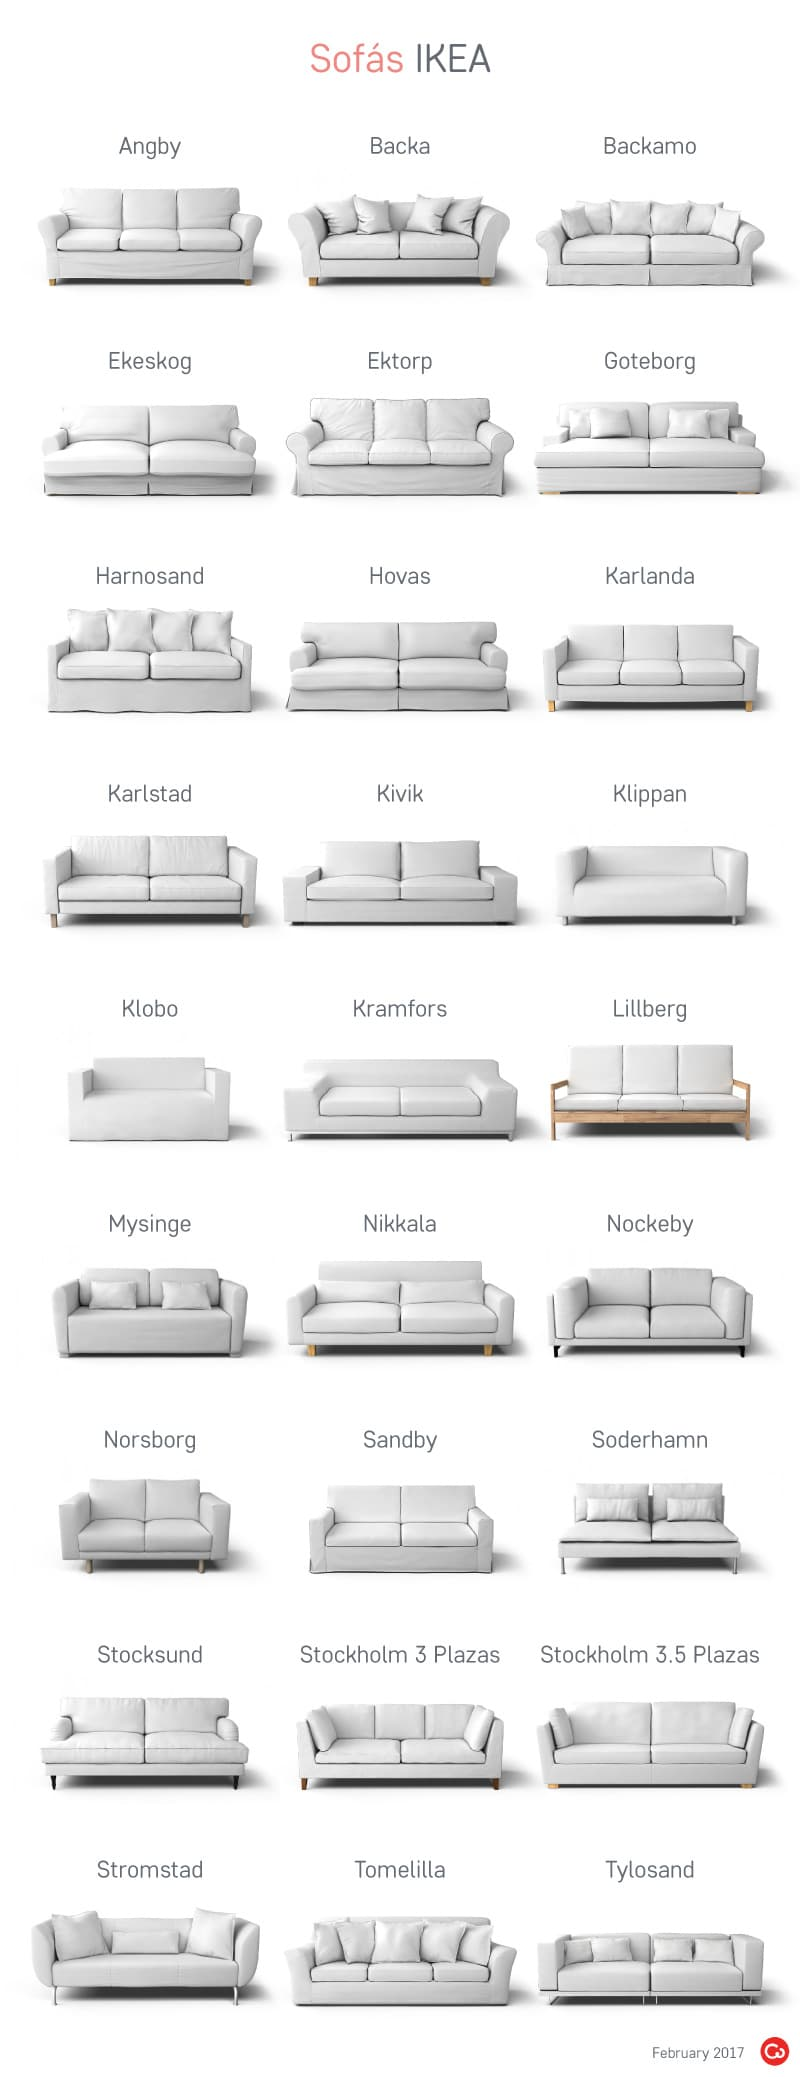 Sofás IKEA Descatalogados